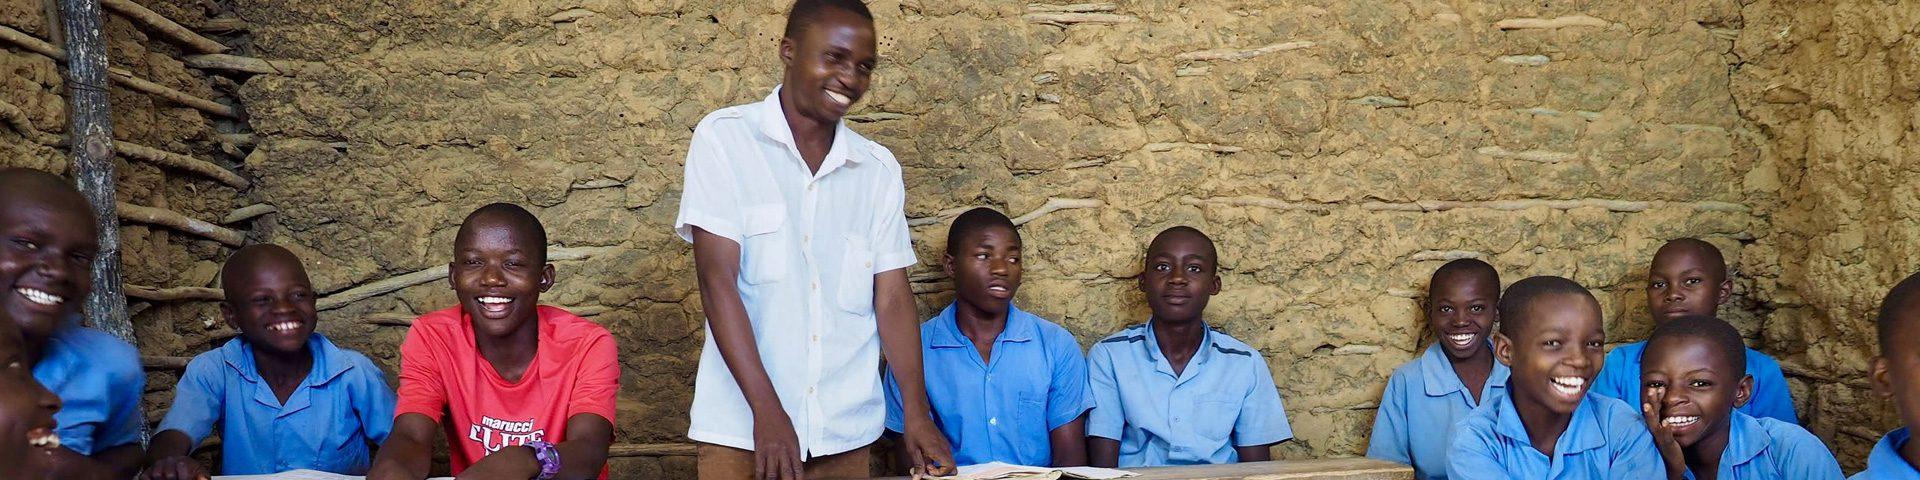 Basisschool in Kenia